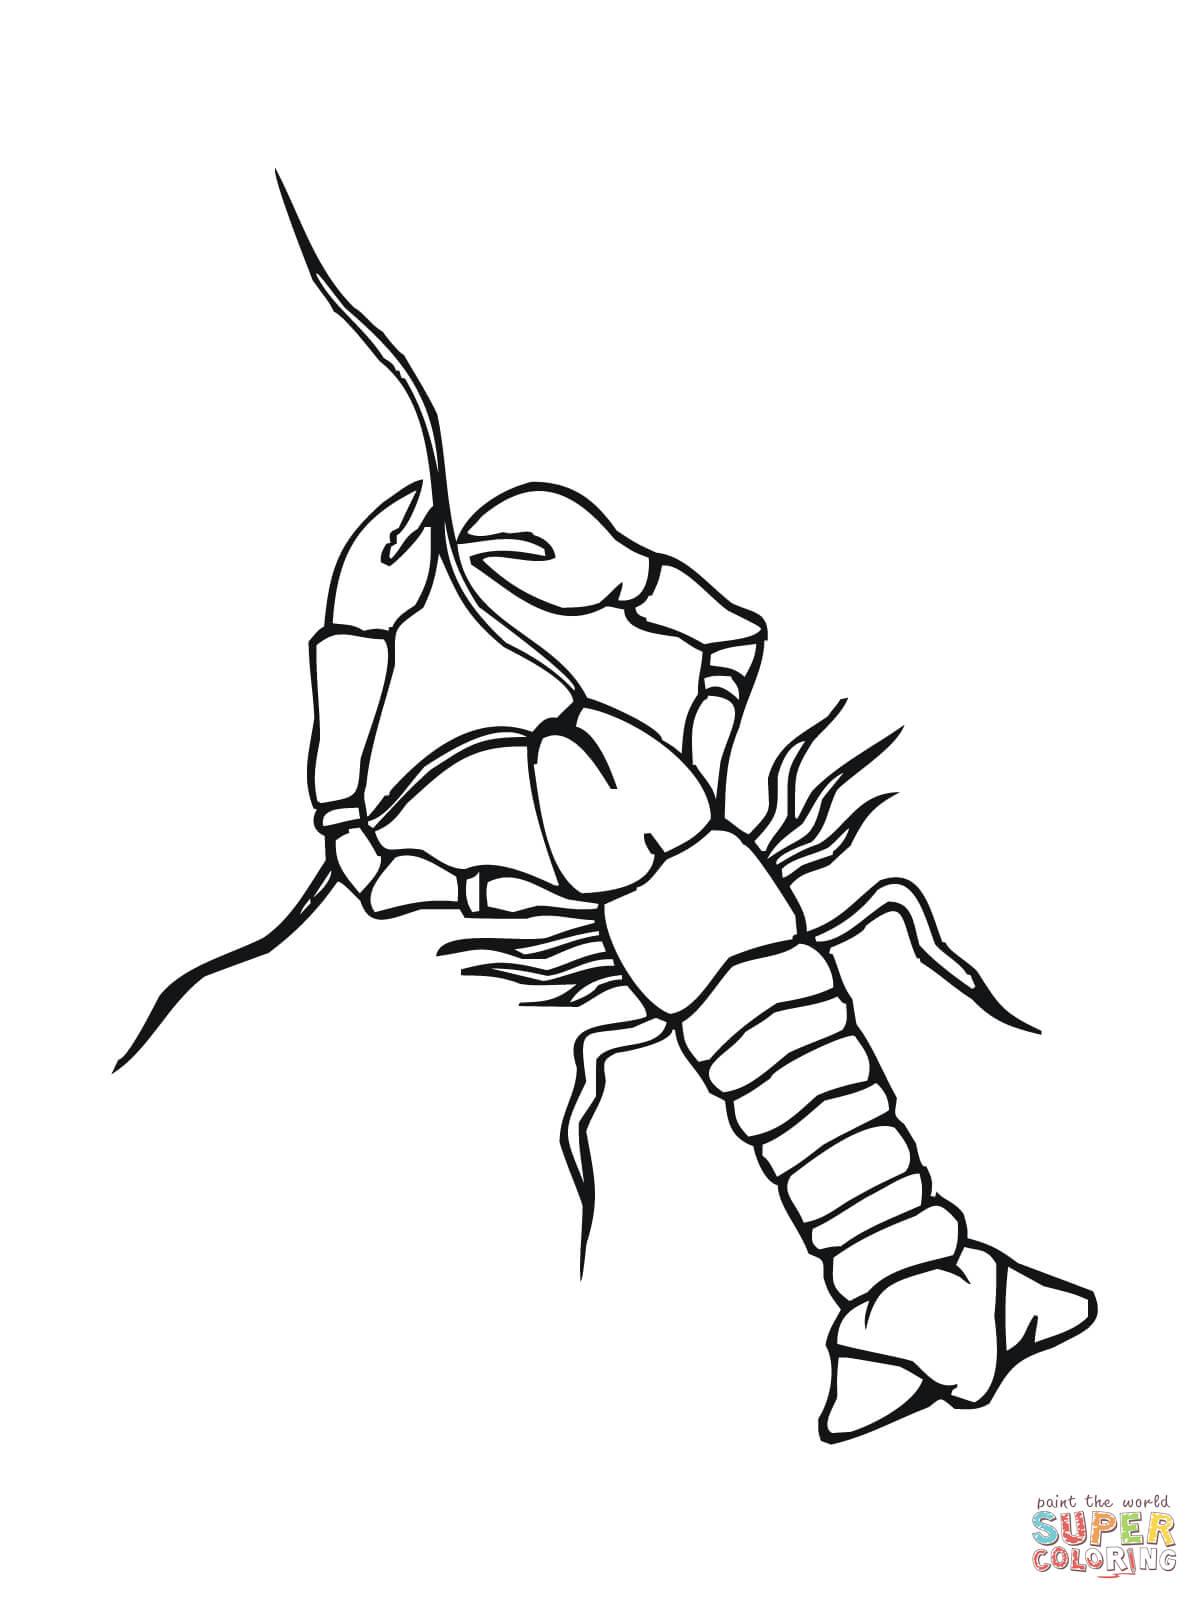 Crawfish Coloring Page Coloring Home Crawfish Coloring Page